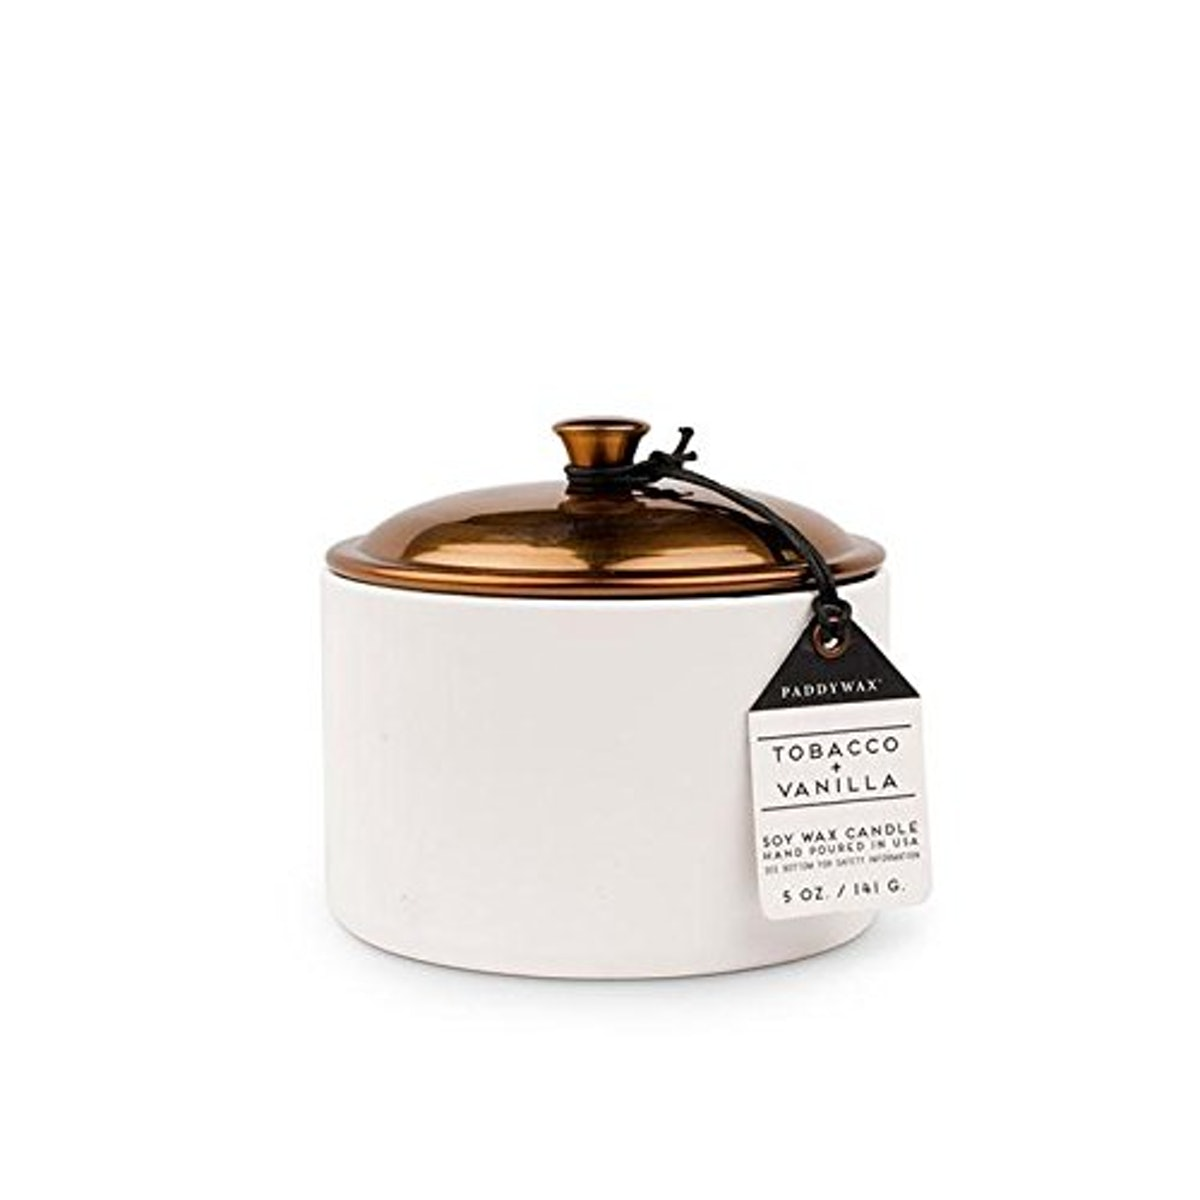 Paddywax Tobacco & Vanilla Soy Candle